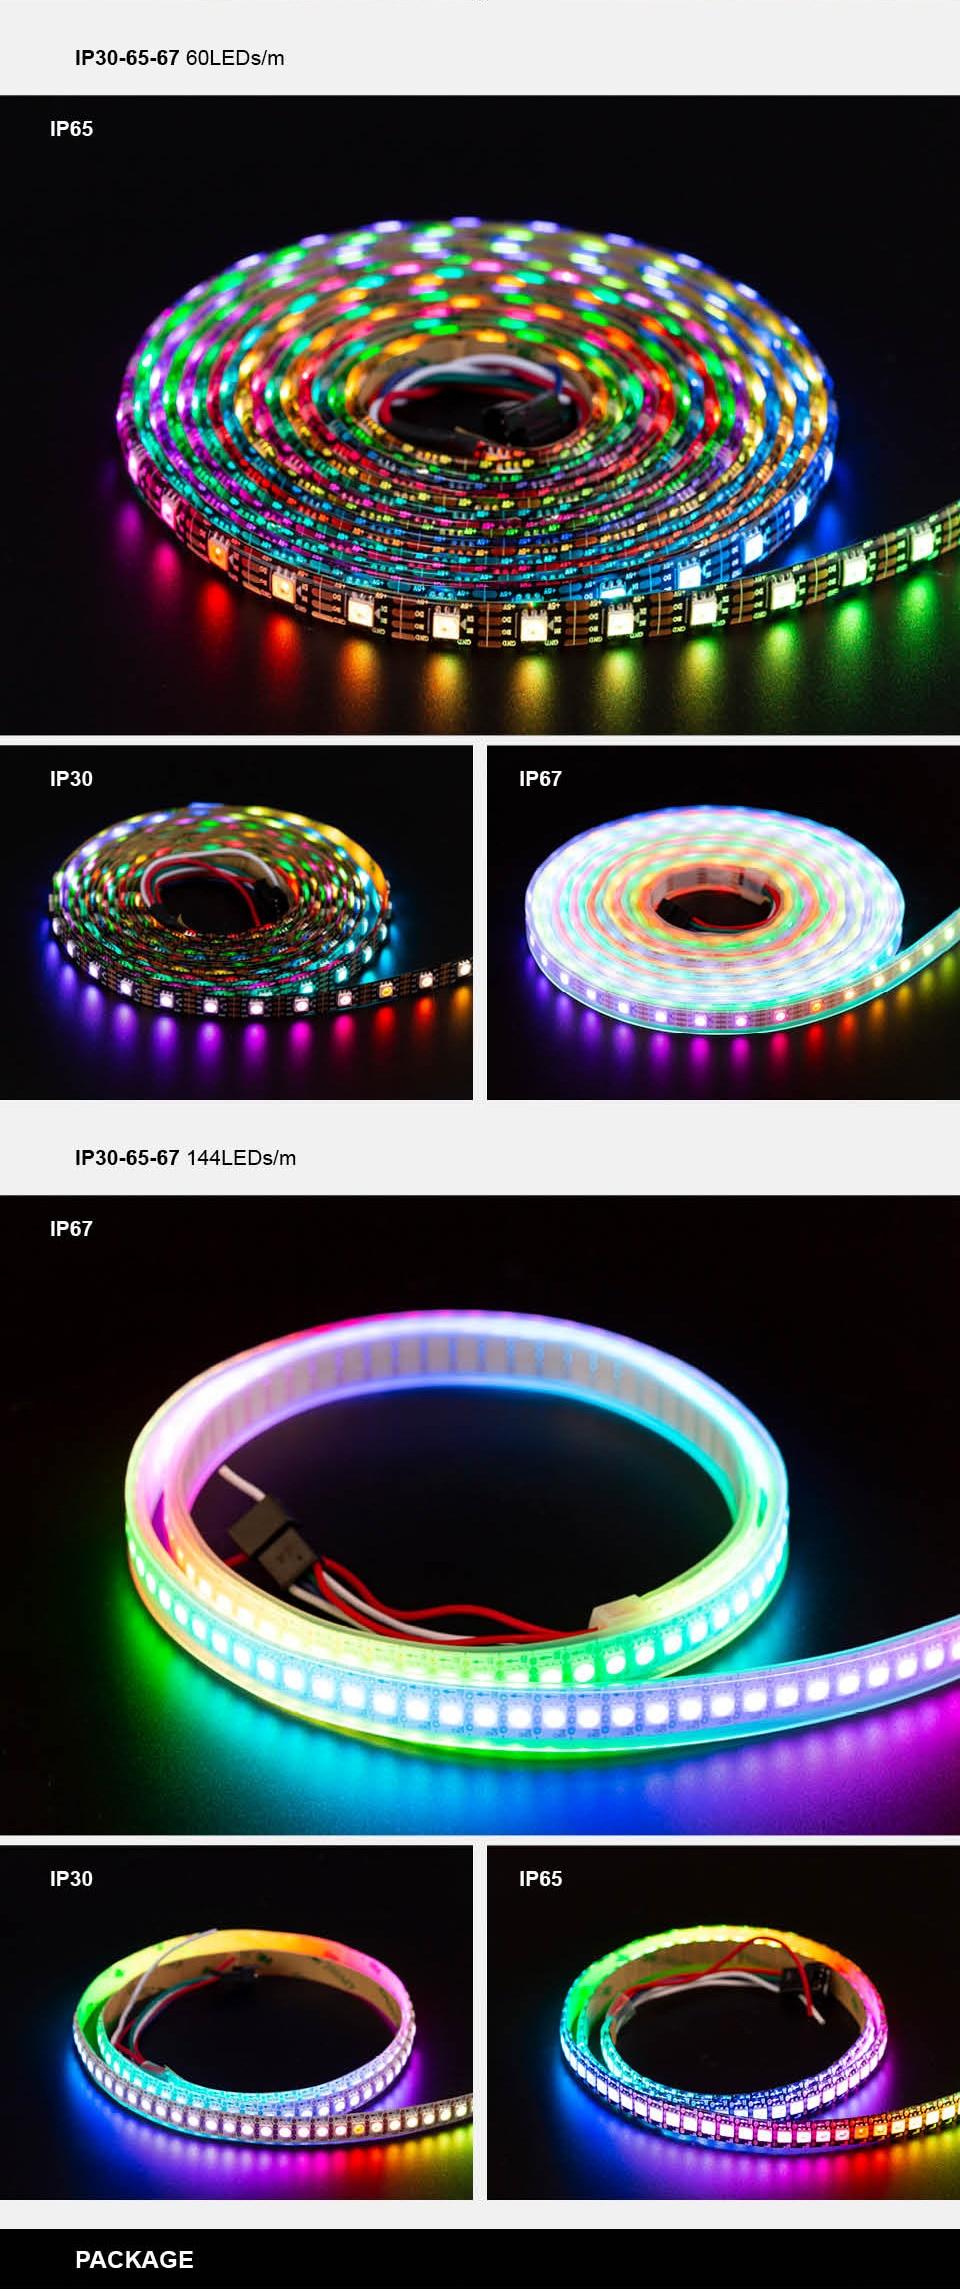 HTB1LN 7adfvK1RjSszhq6AcGFXad WS2815 DC12V (WS2812B/WS2813) RGB LED Pixels Strip Light Individually Addressable LED Dual-Signal 1m/5m 30/60/144 Pixels/Leds/m